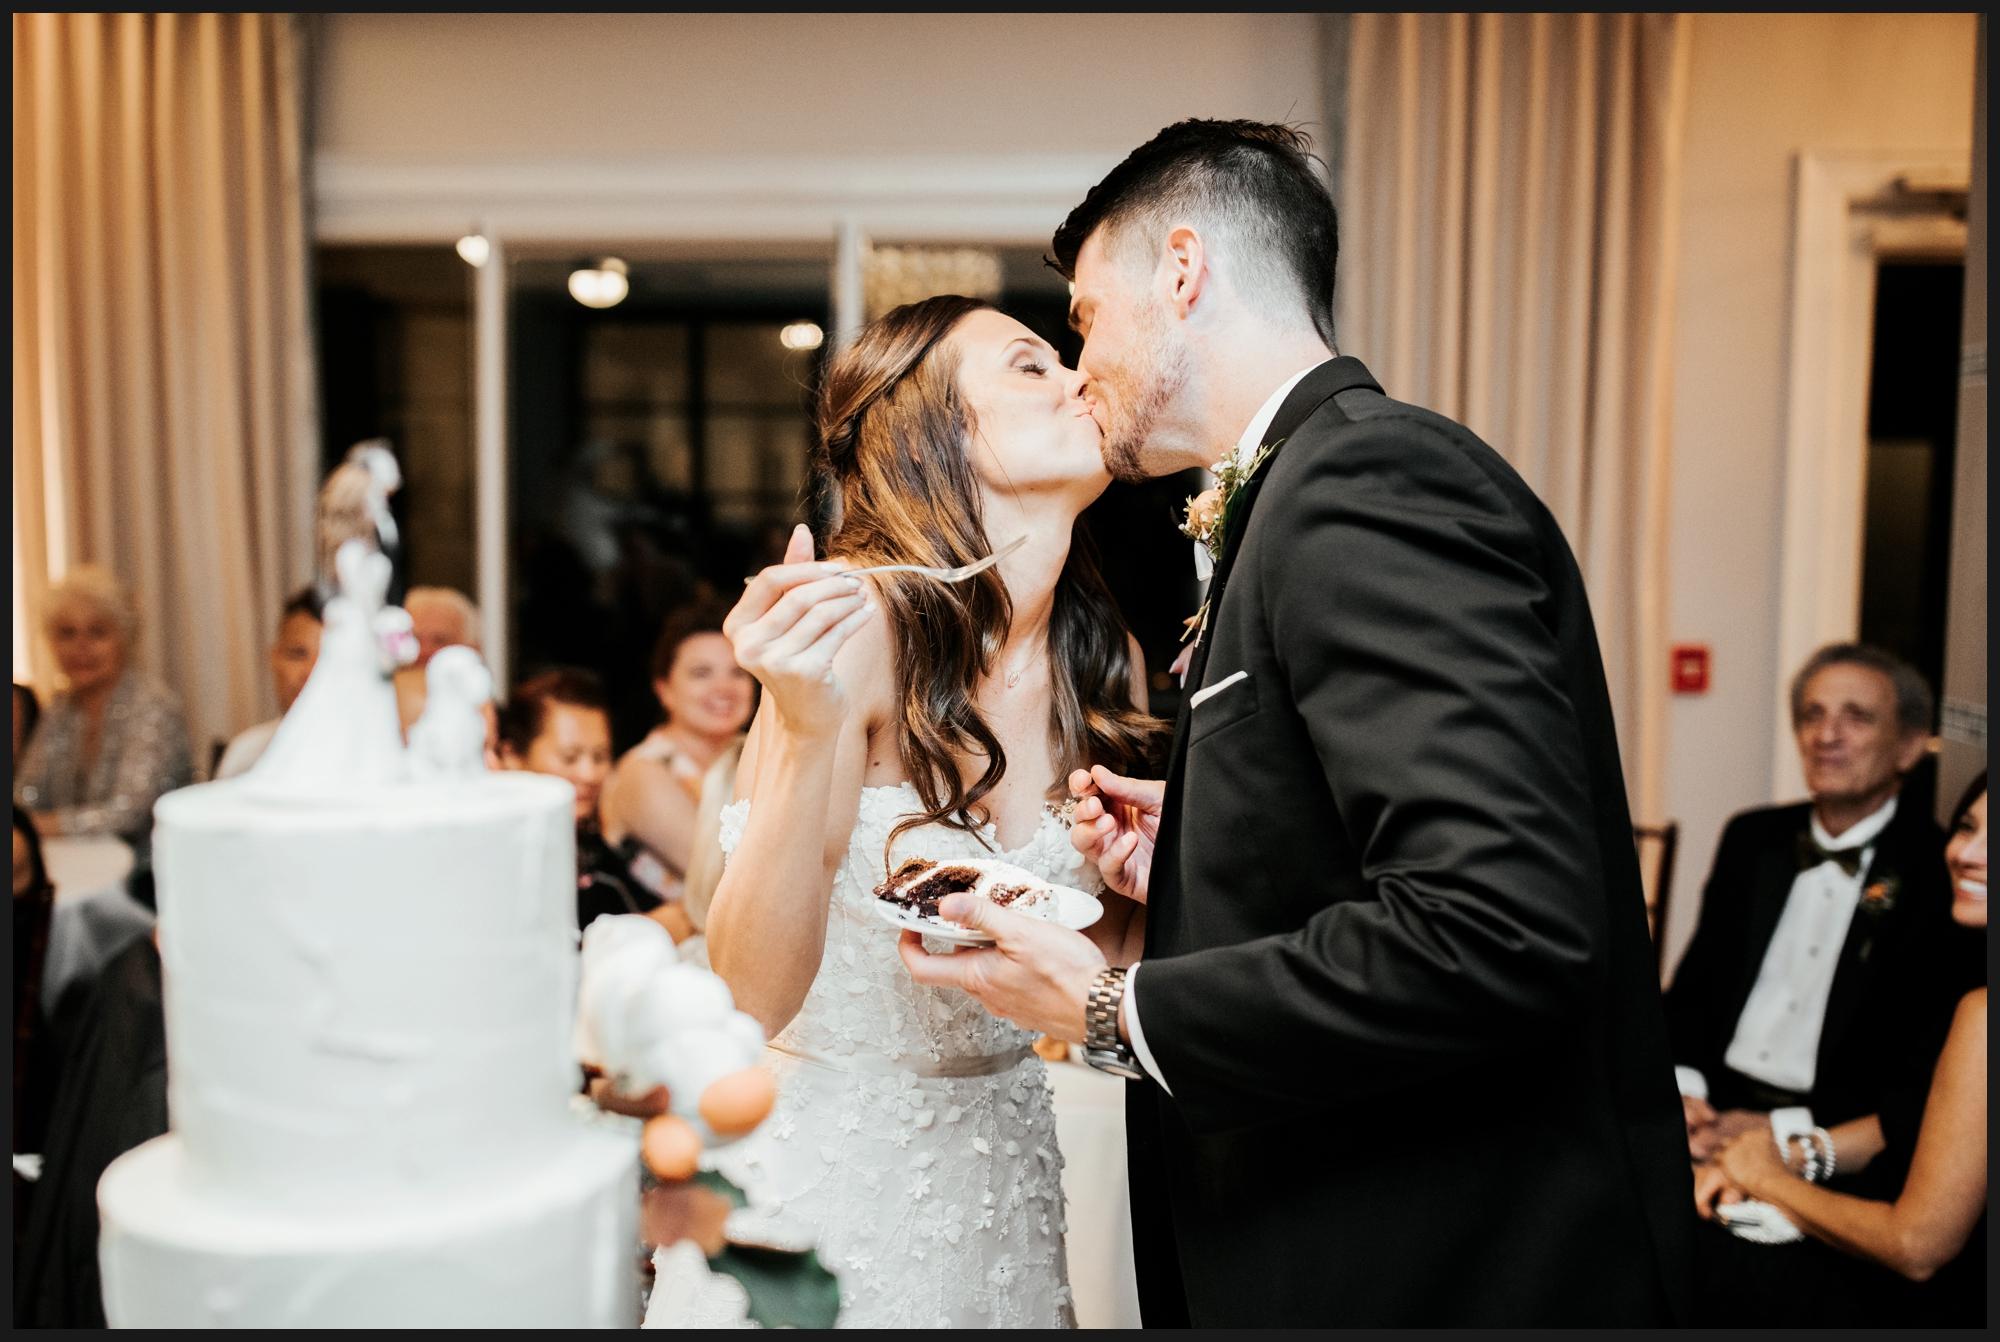 Orlando-Wedding-Photographer-destination-wedding-photographer-florida-wedding-photographer-hawaii-wedding-photographer_0253.jpg